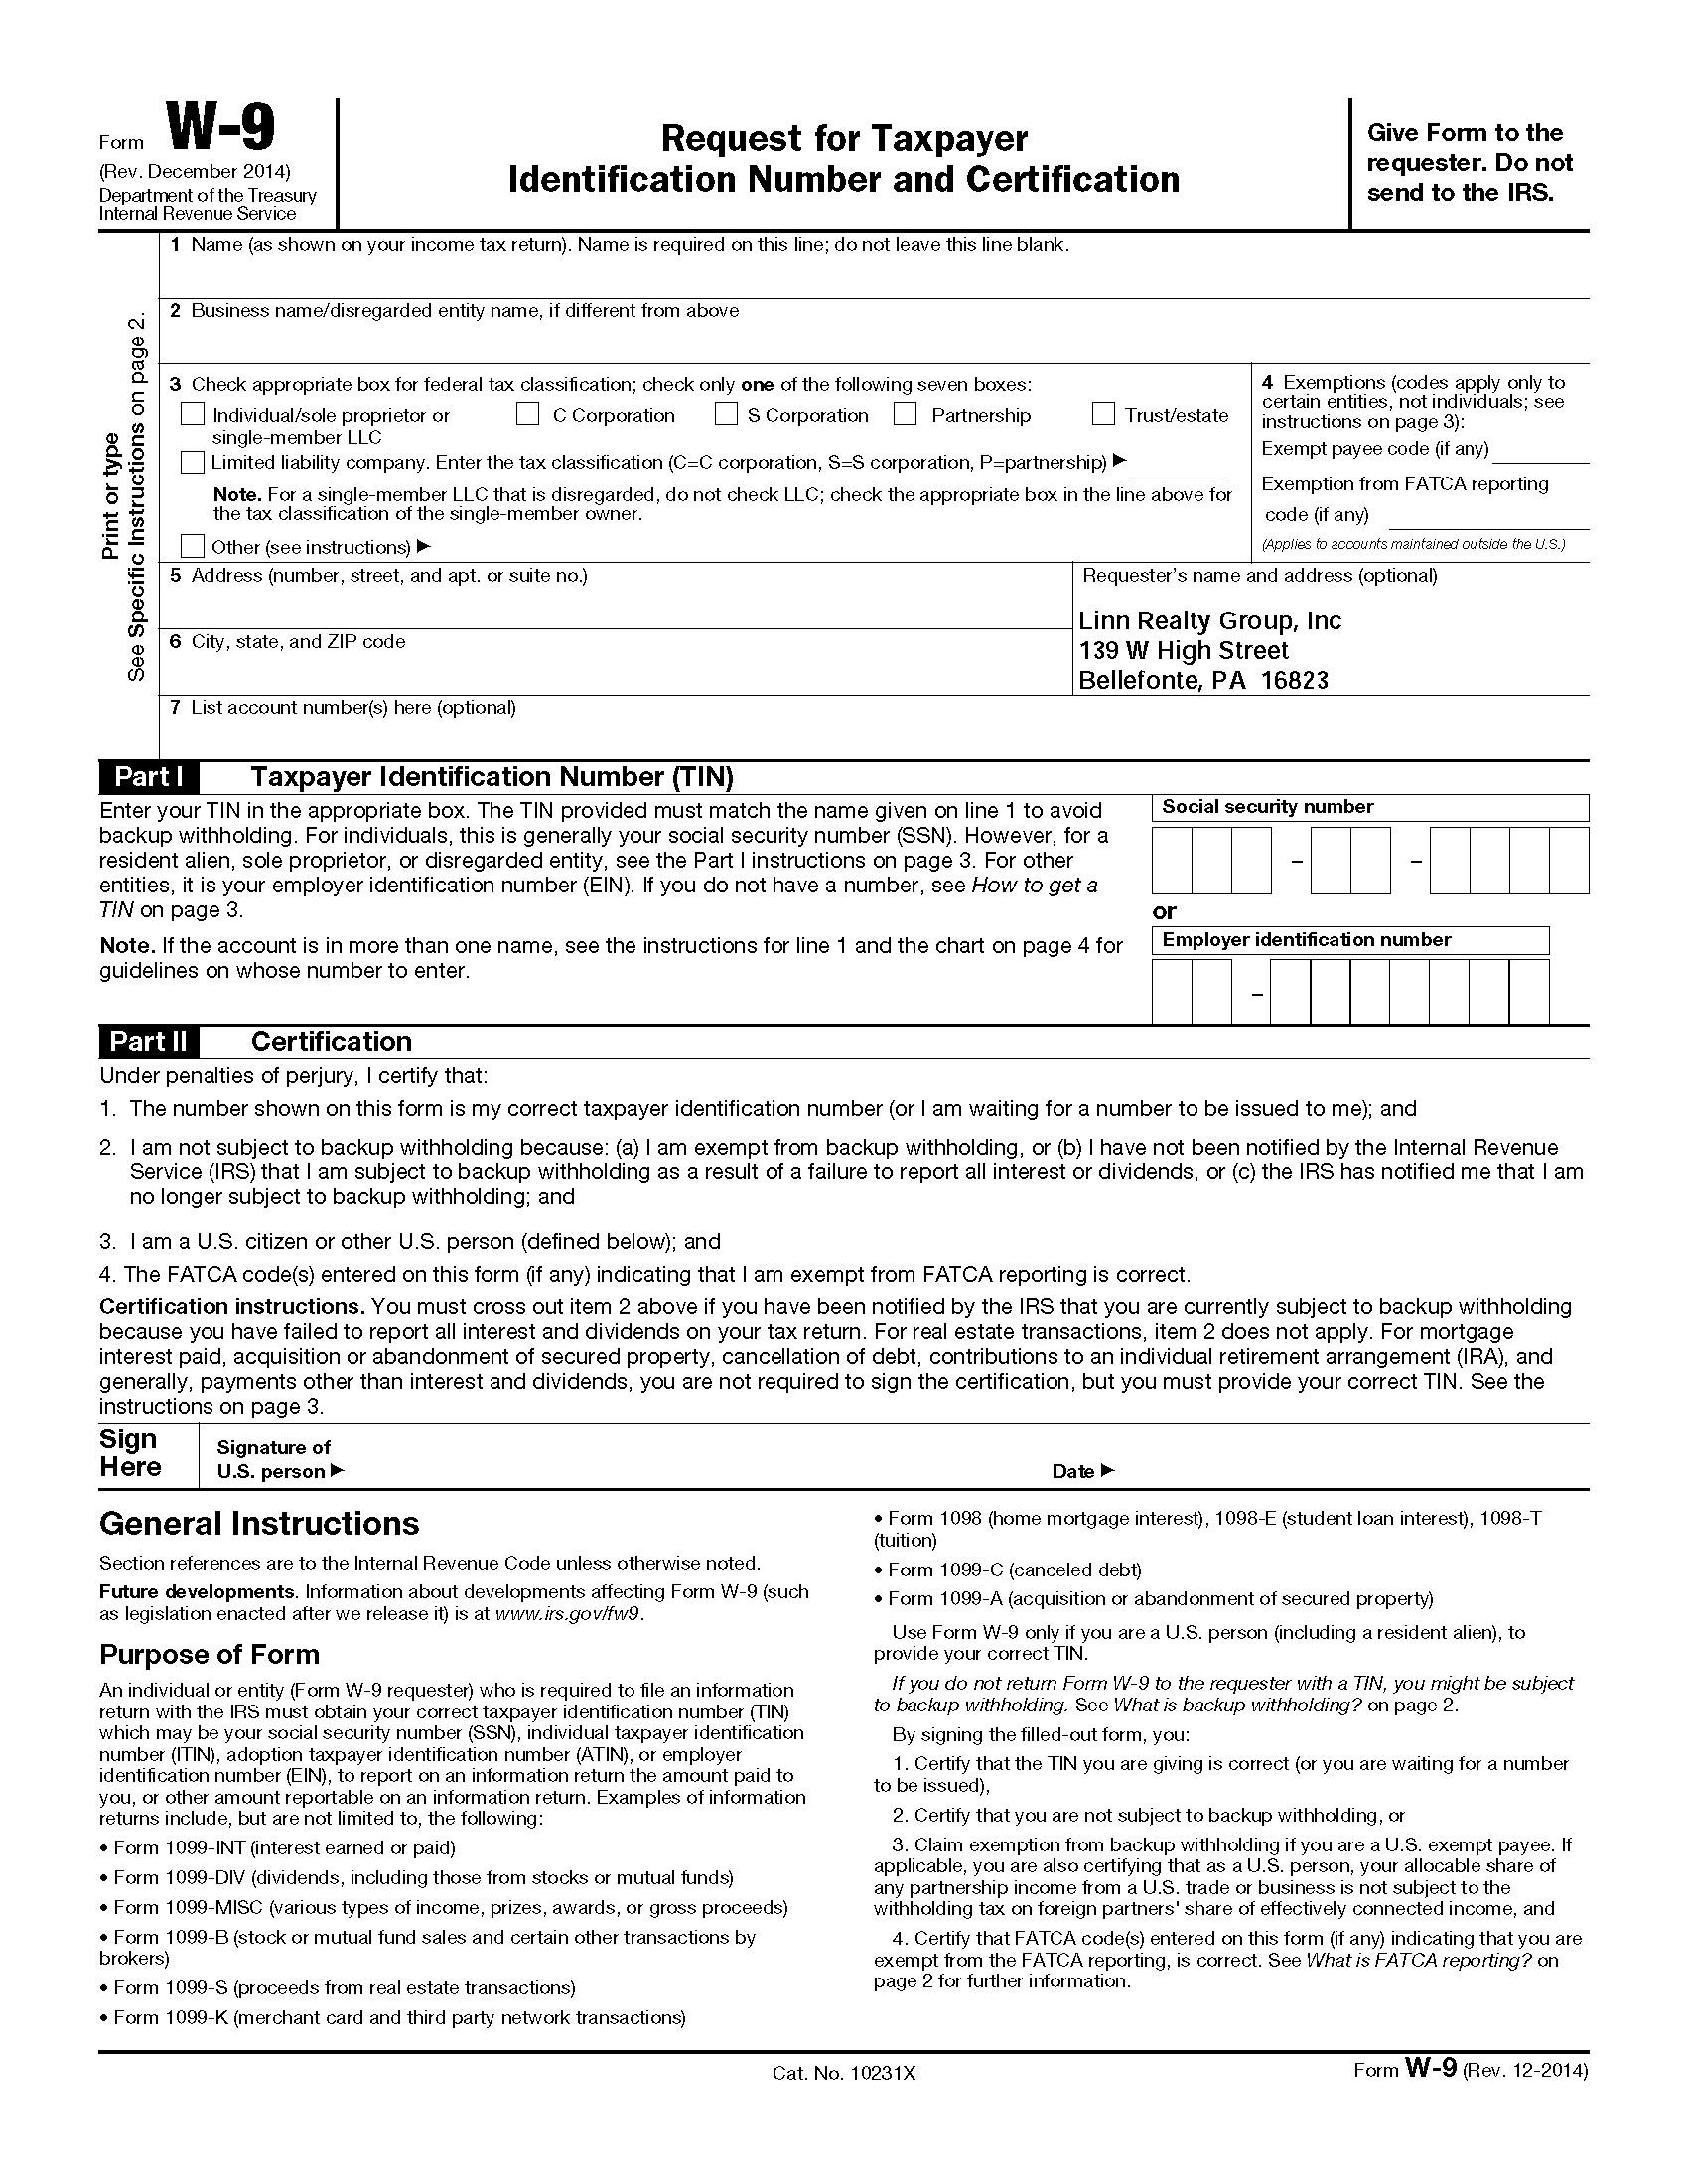 Blank 2019 W 9 Form Printable | Calendar Template Printable-W9 Blank Form For Louisiana 2020